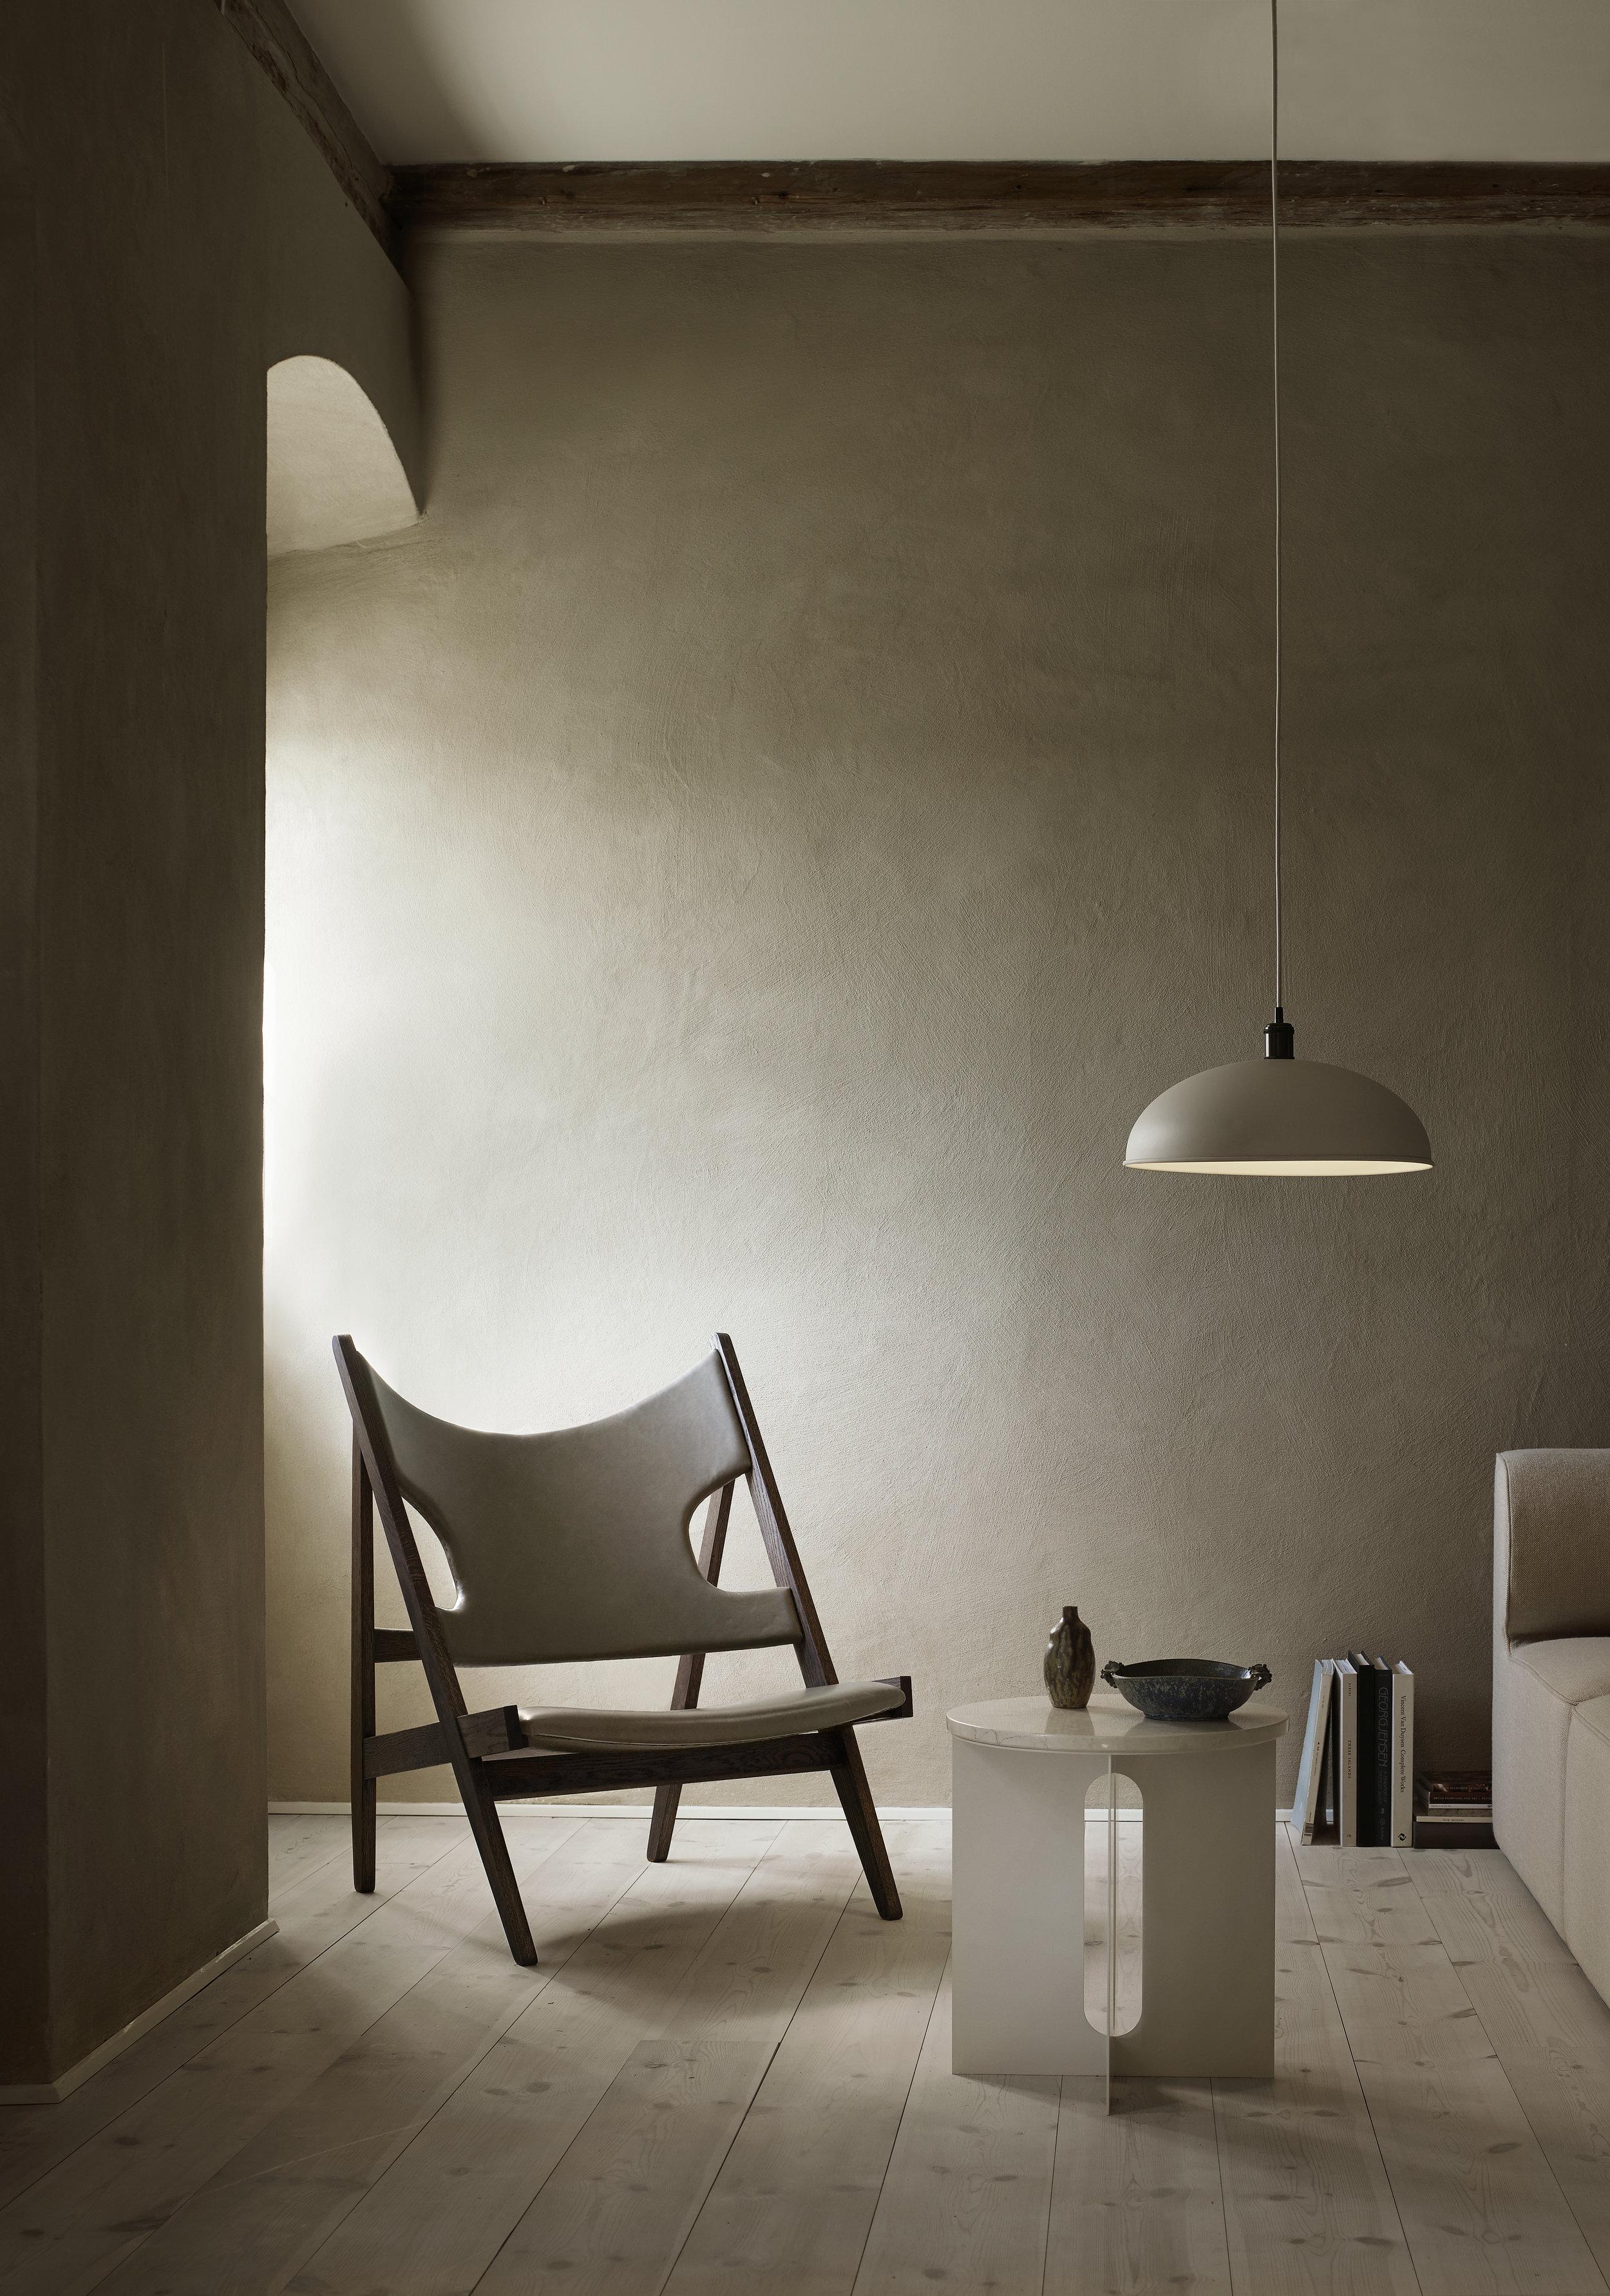 MENU_Kniting-Chair_Androgyne-Table_Hubert-Pendant-45.jpg